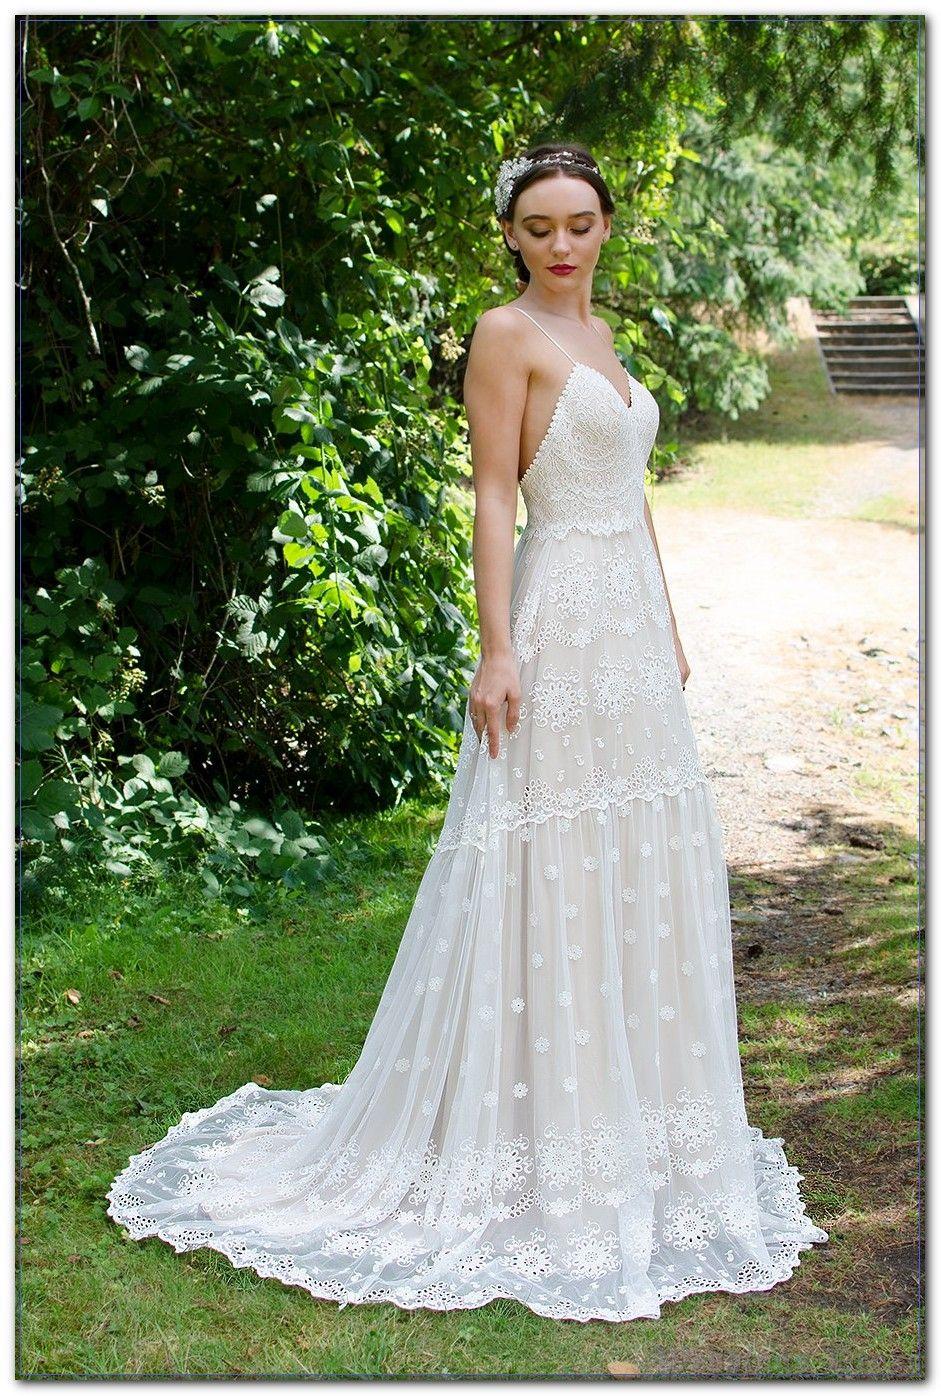 Essential Weddings Dress Smartphone Apps